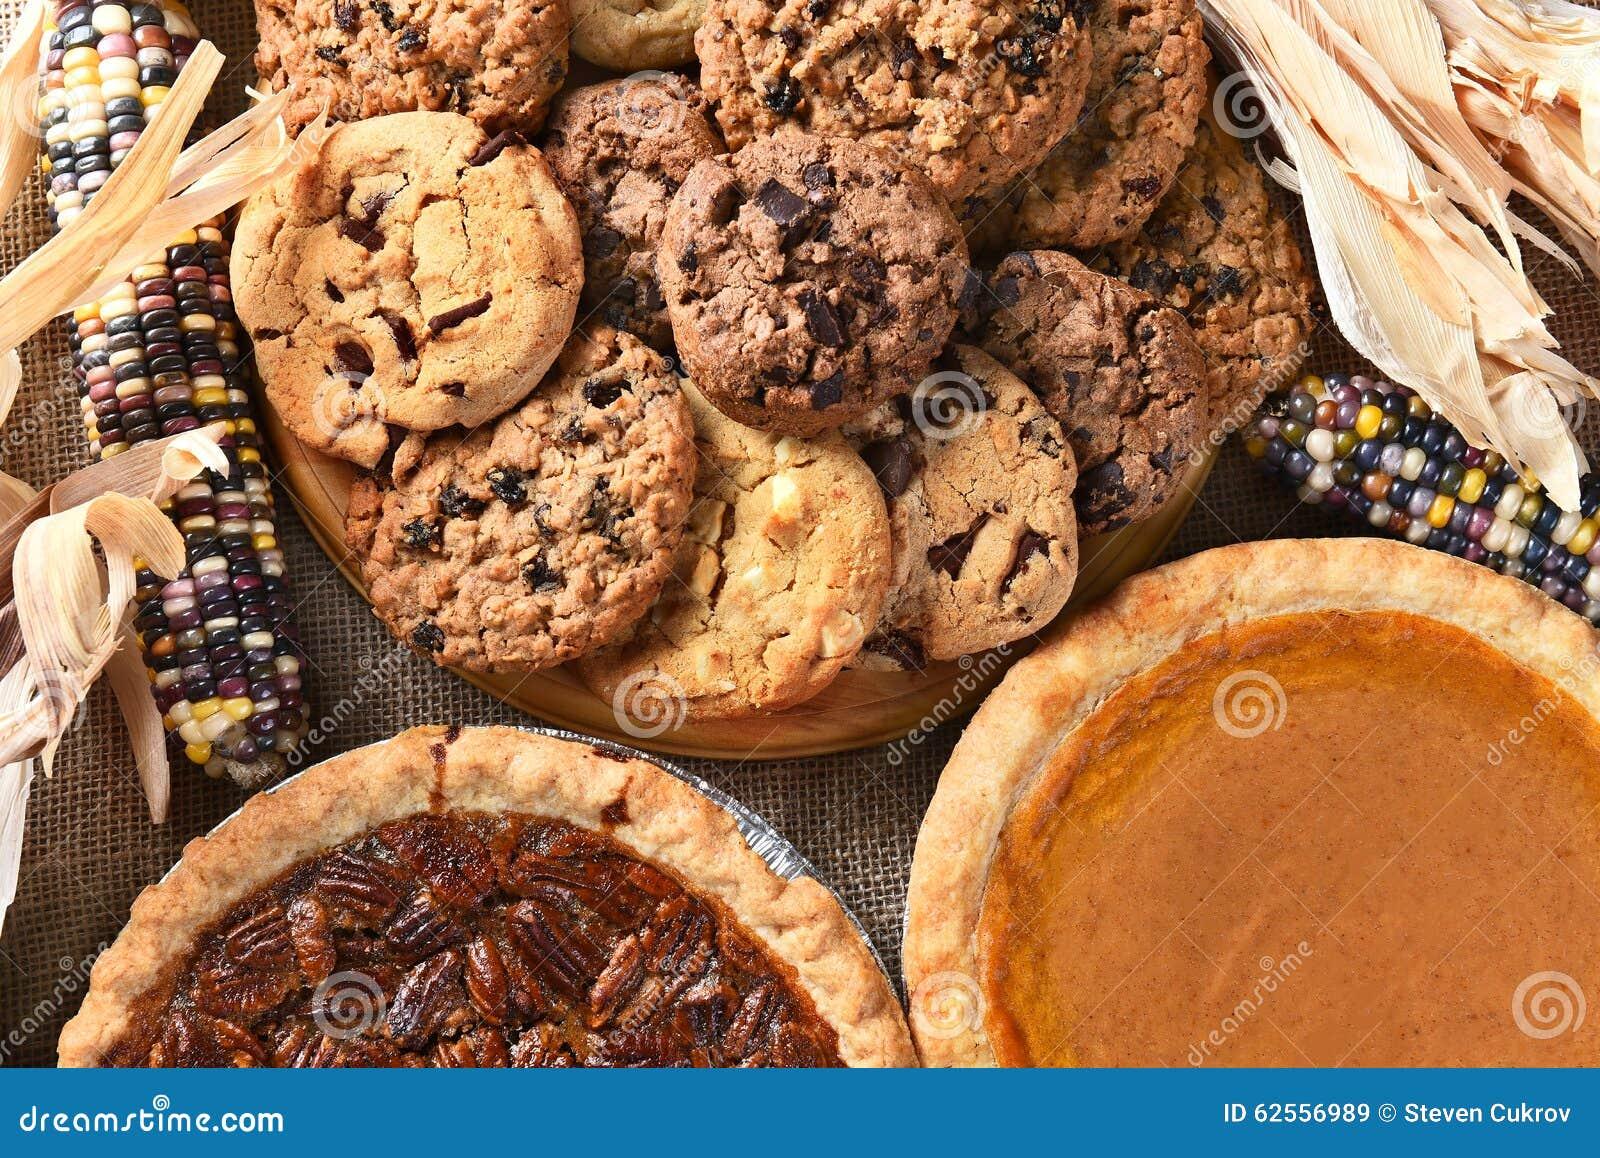 ... pies-cookies-day-feast-pecan-pie-pumpkin-pie-chocolate-chip-oatmeal